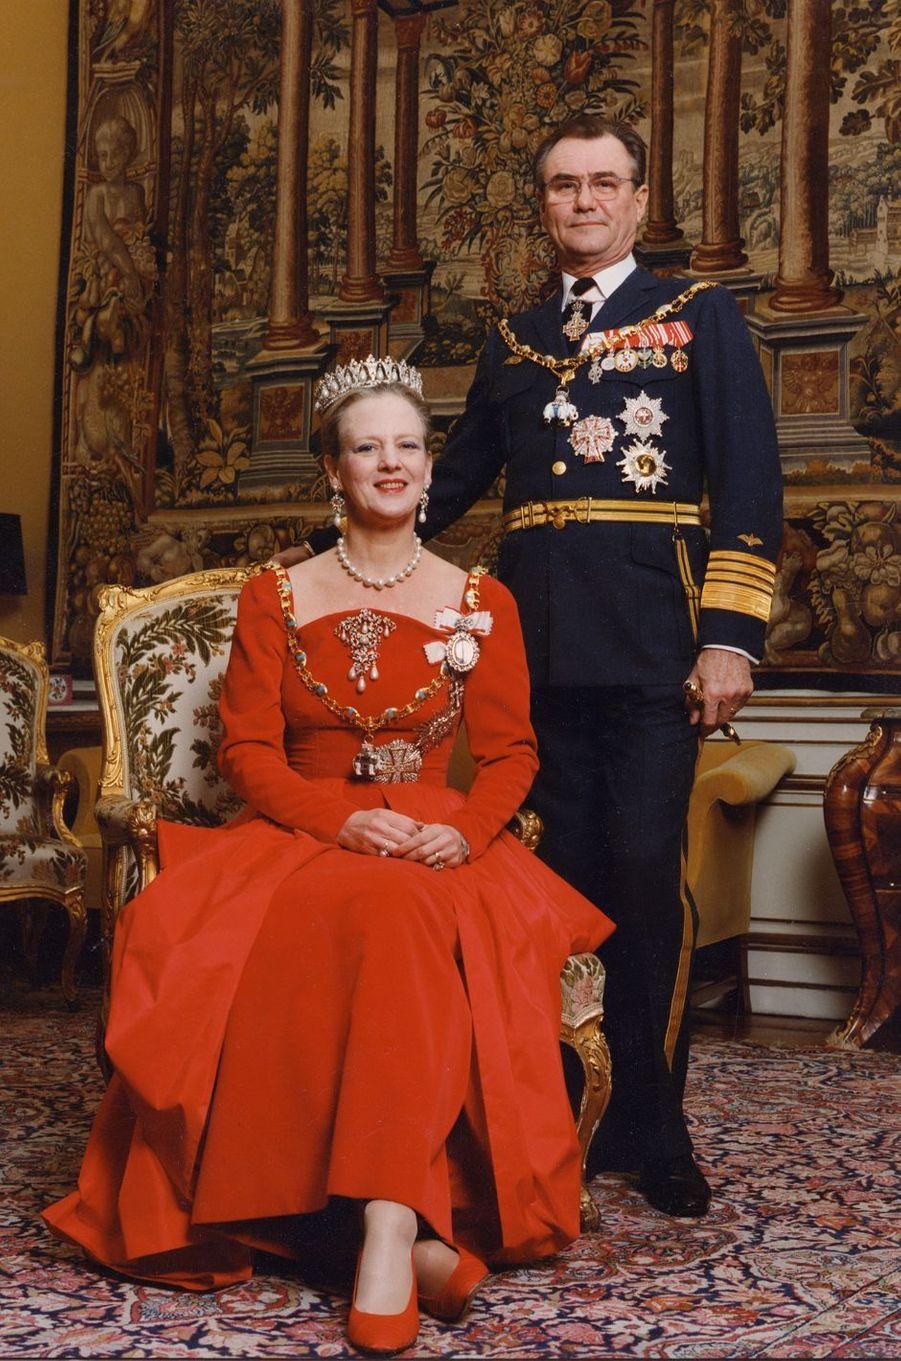 Le prince Henrik de Danemark avec la reine Margrethe II, le 1er janvier 1992